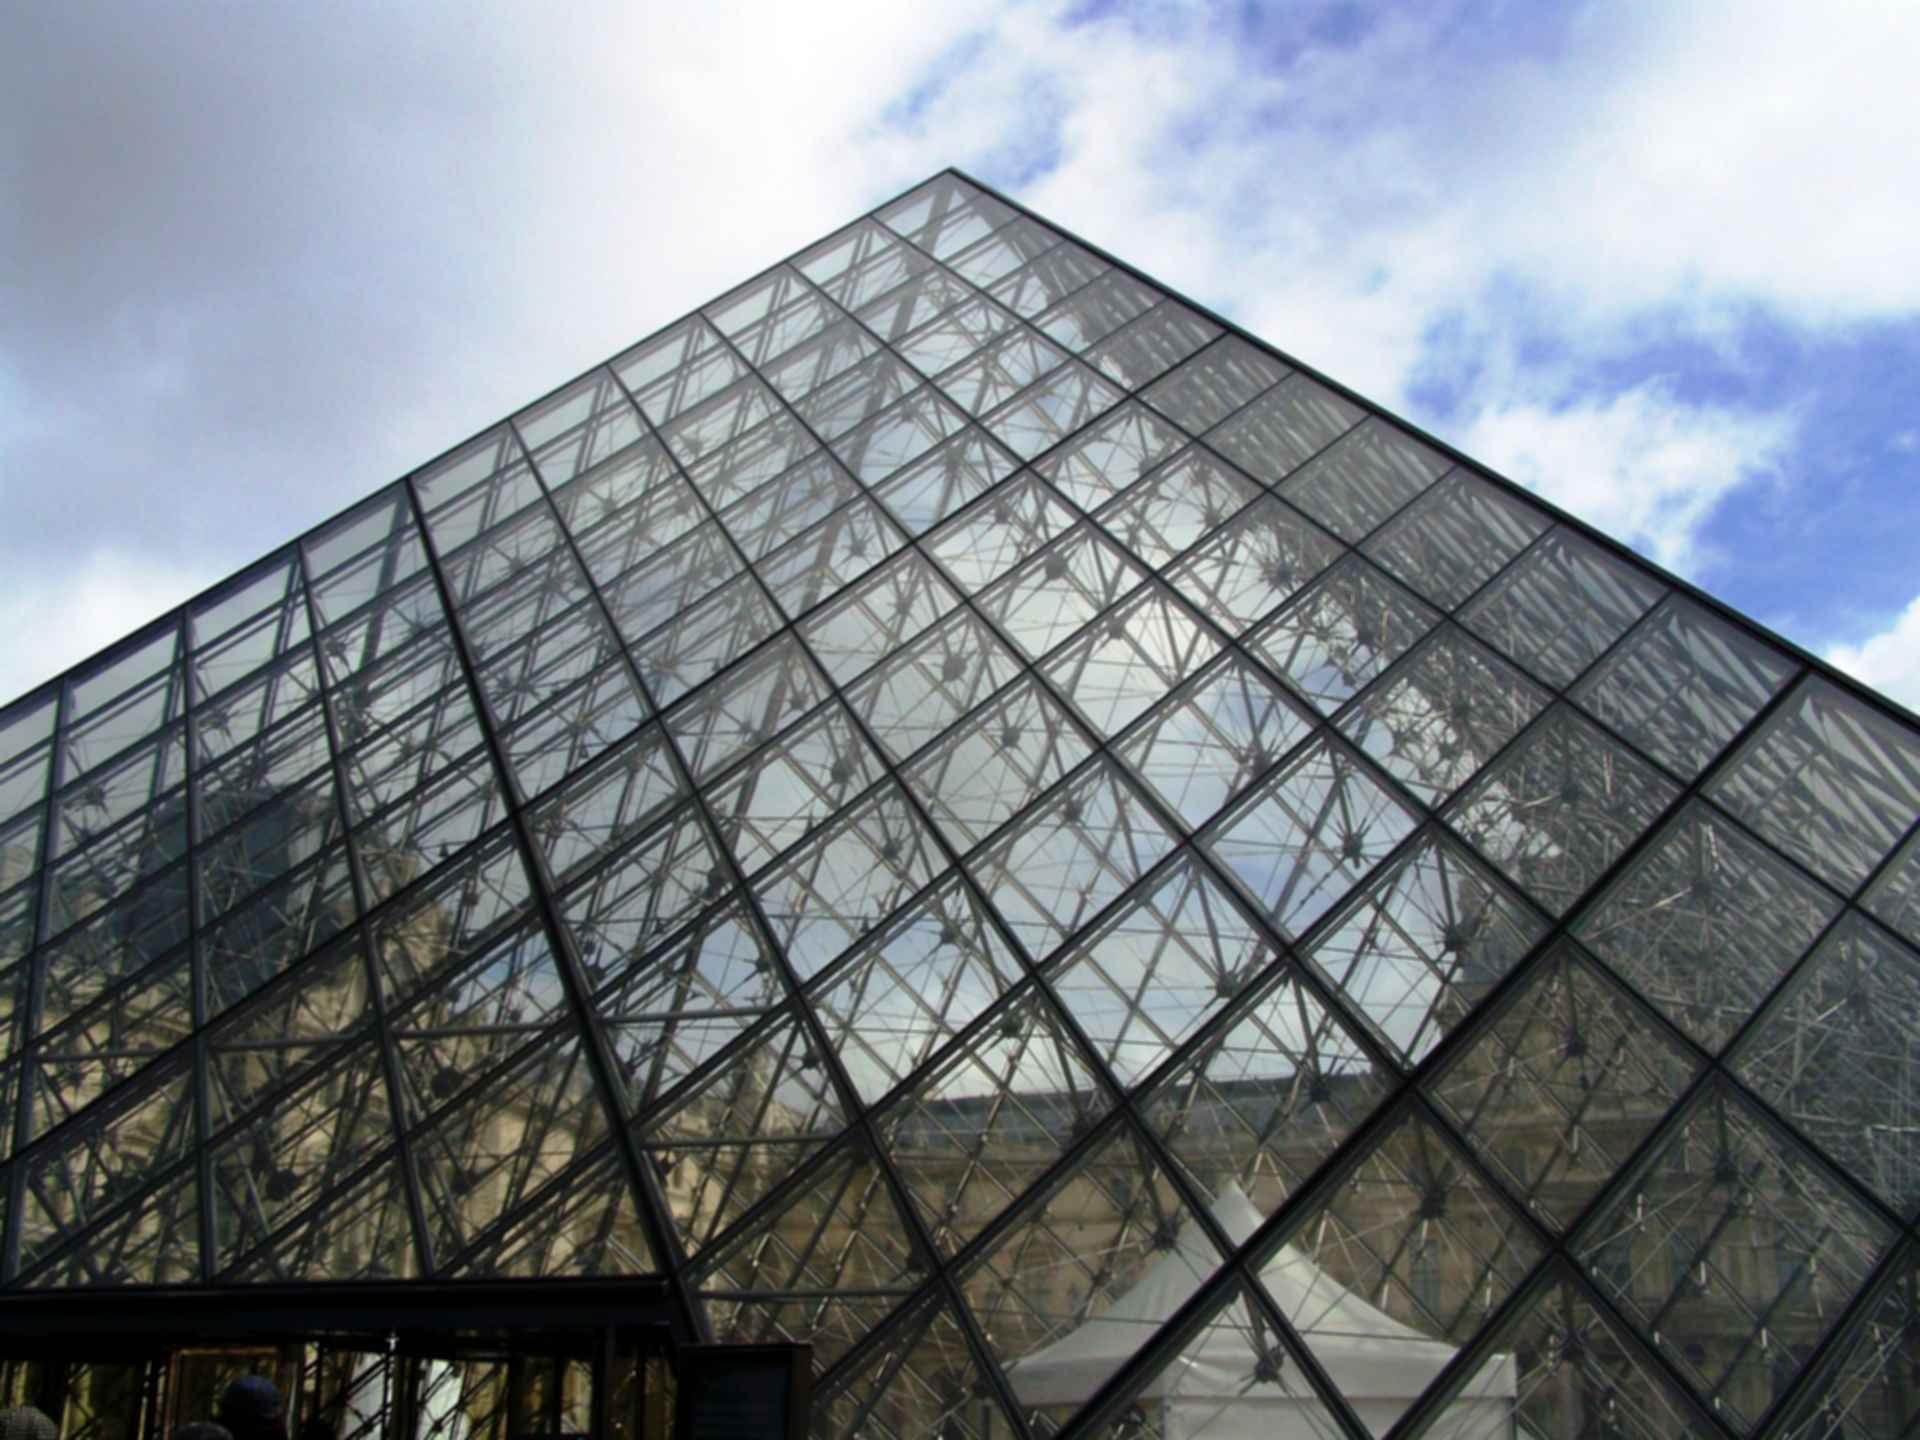 The Louvre Paris - Pyramid Detail